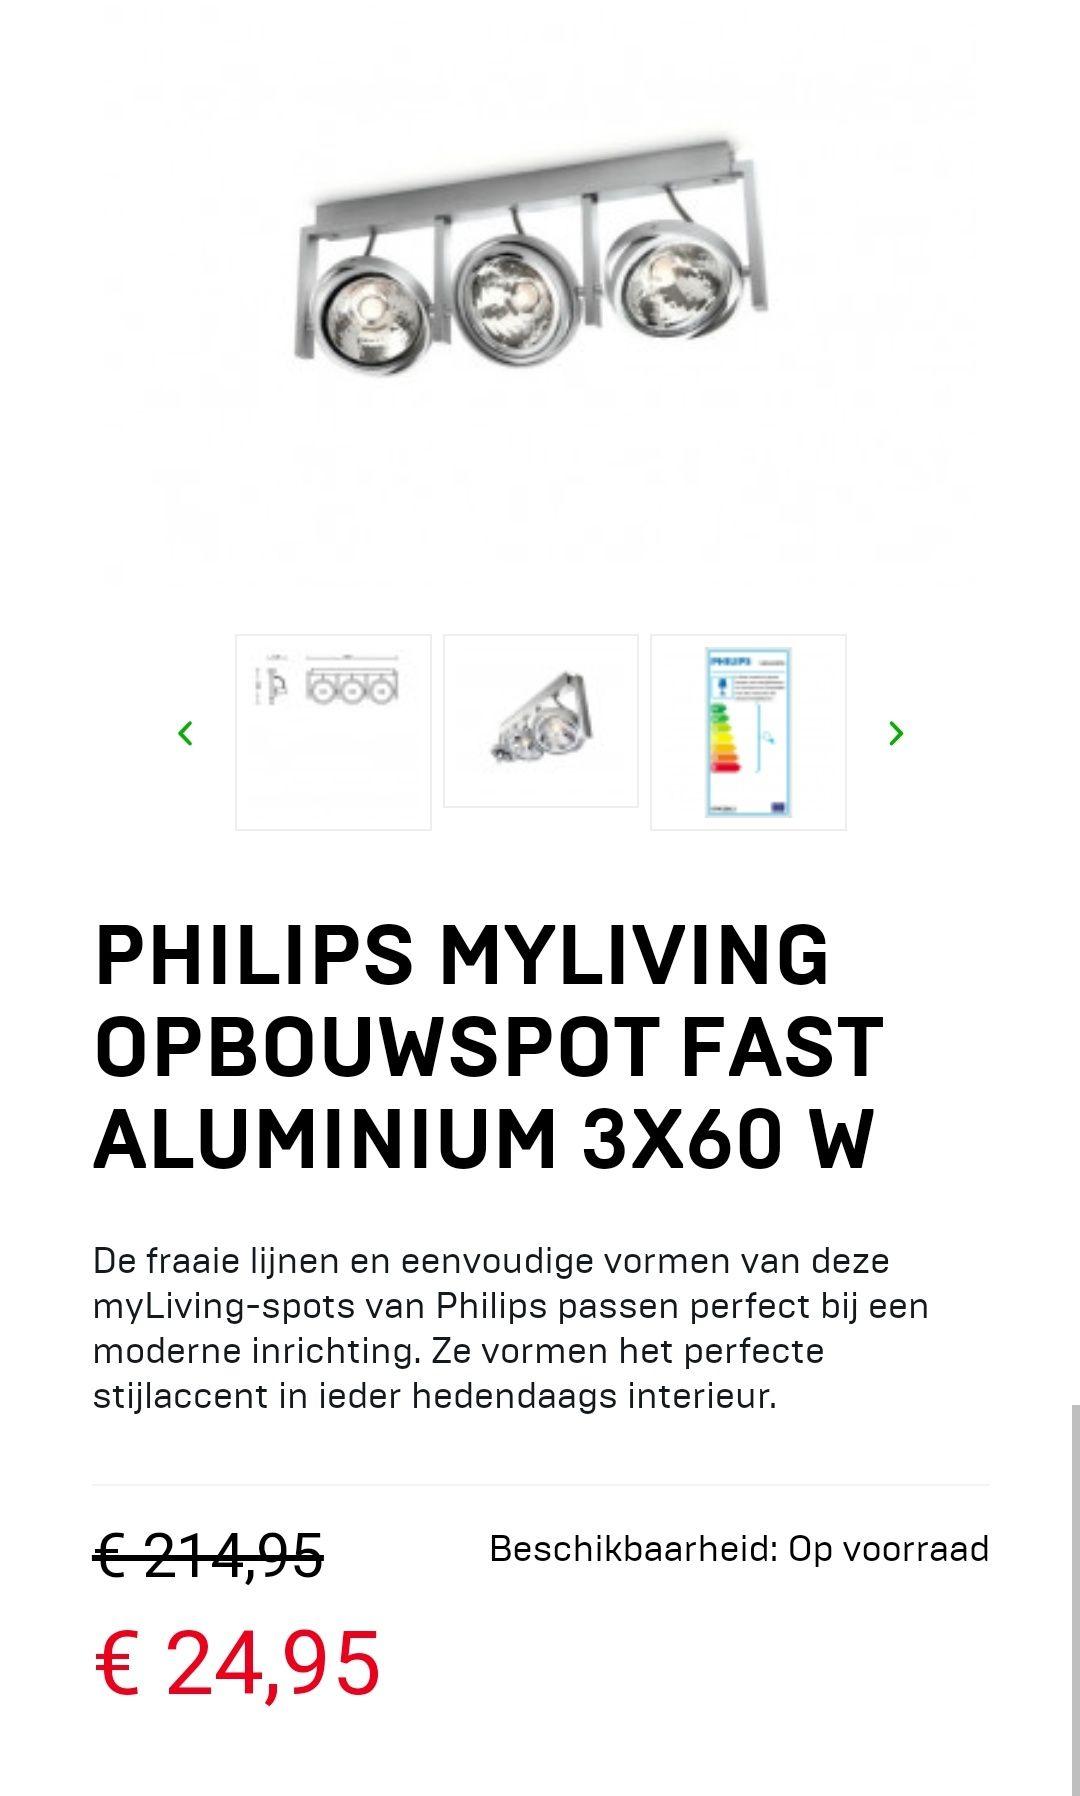 PHILIPS MyLiving opbouwspotd aluminium 3X60W